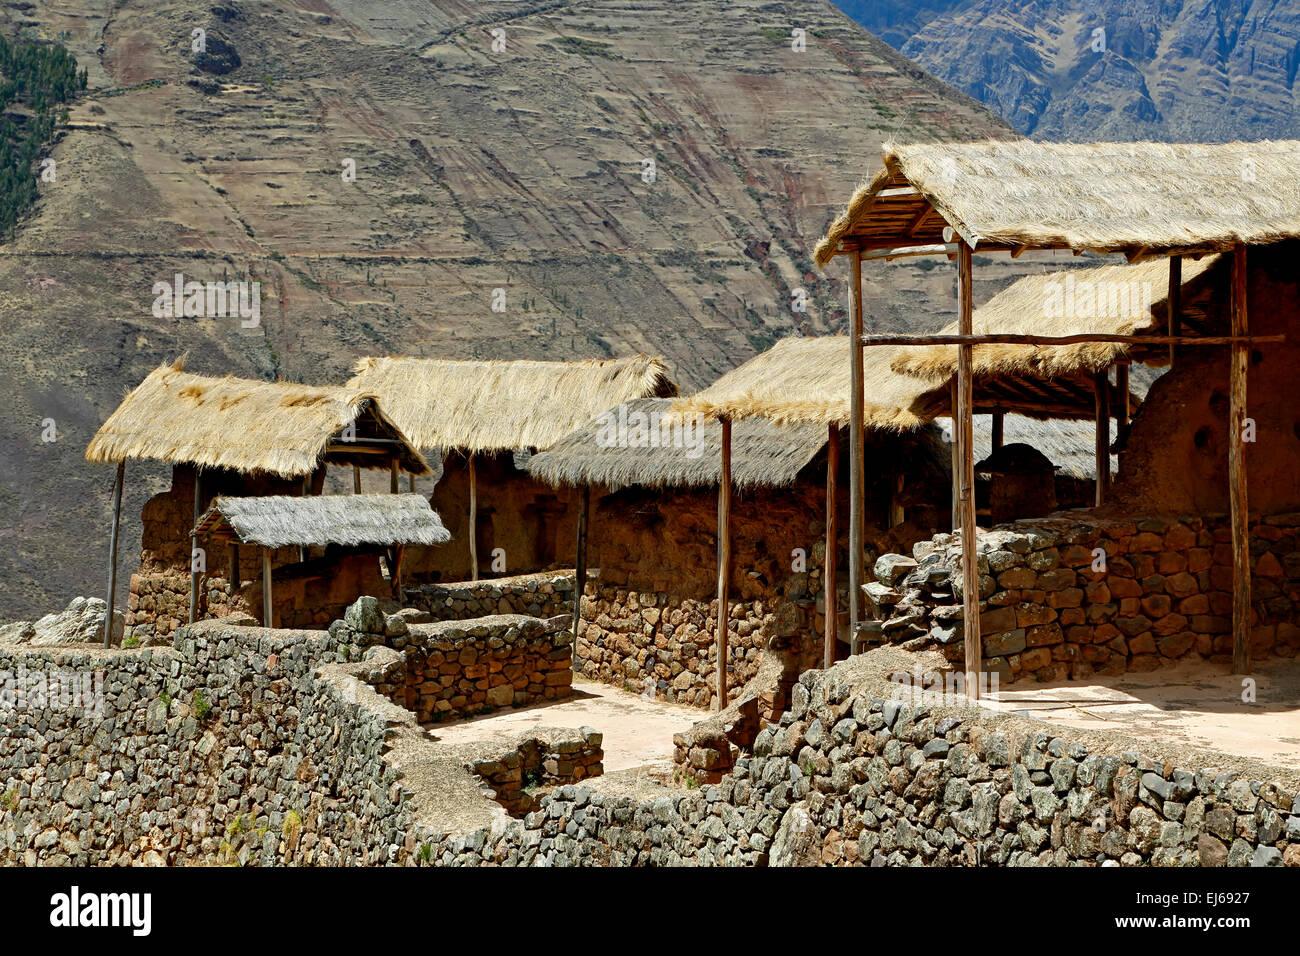 Thatch roof-covered buildings, Pisac Inca ruins, Pisac, Cusco, Peru - Stock Image